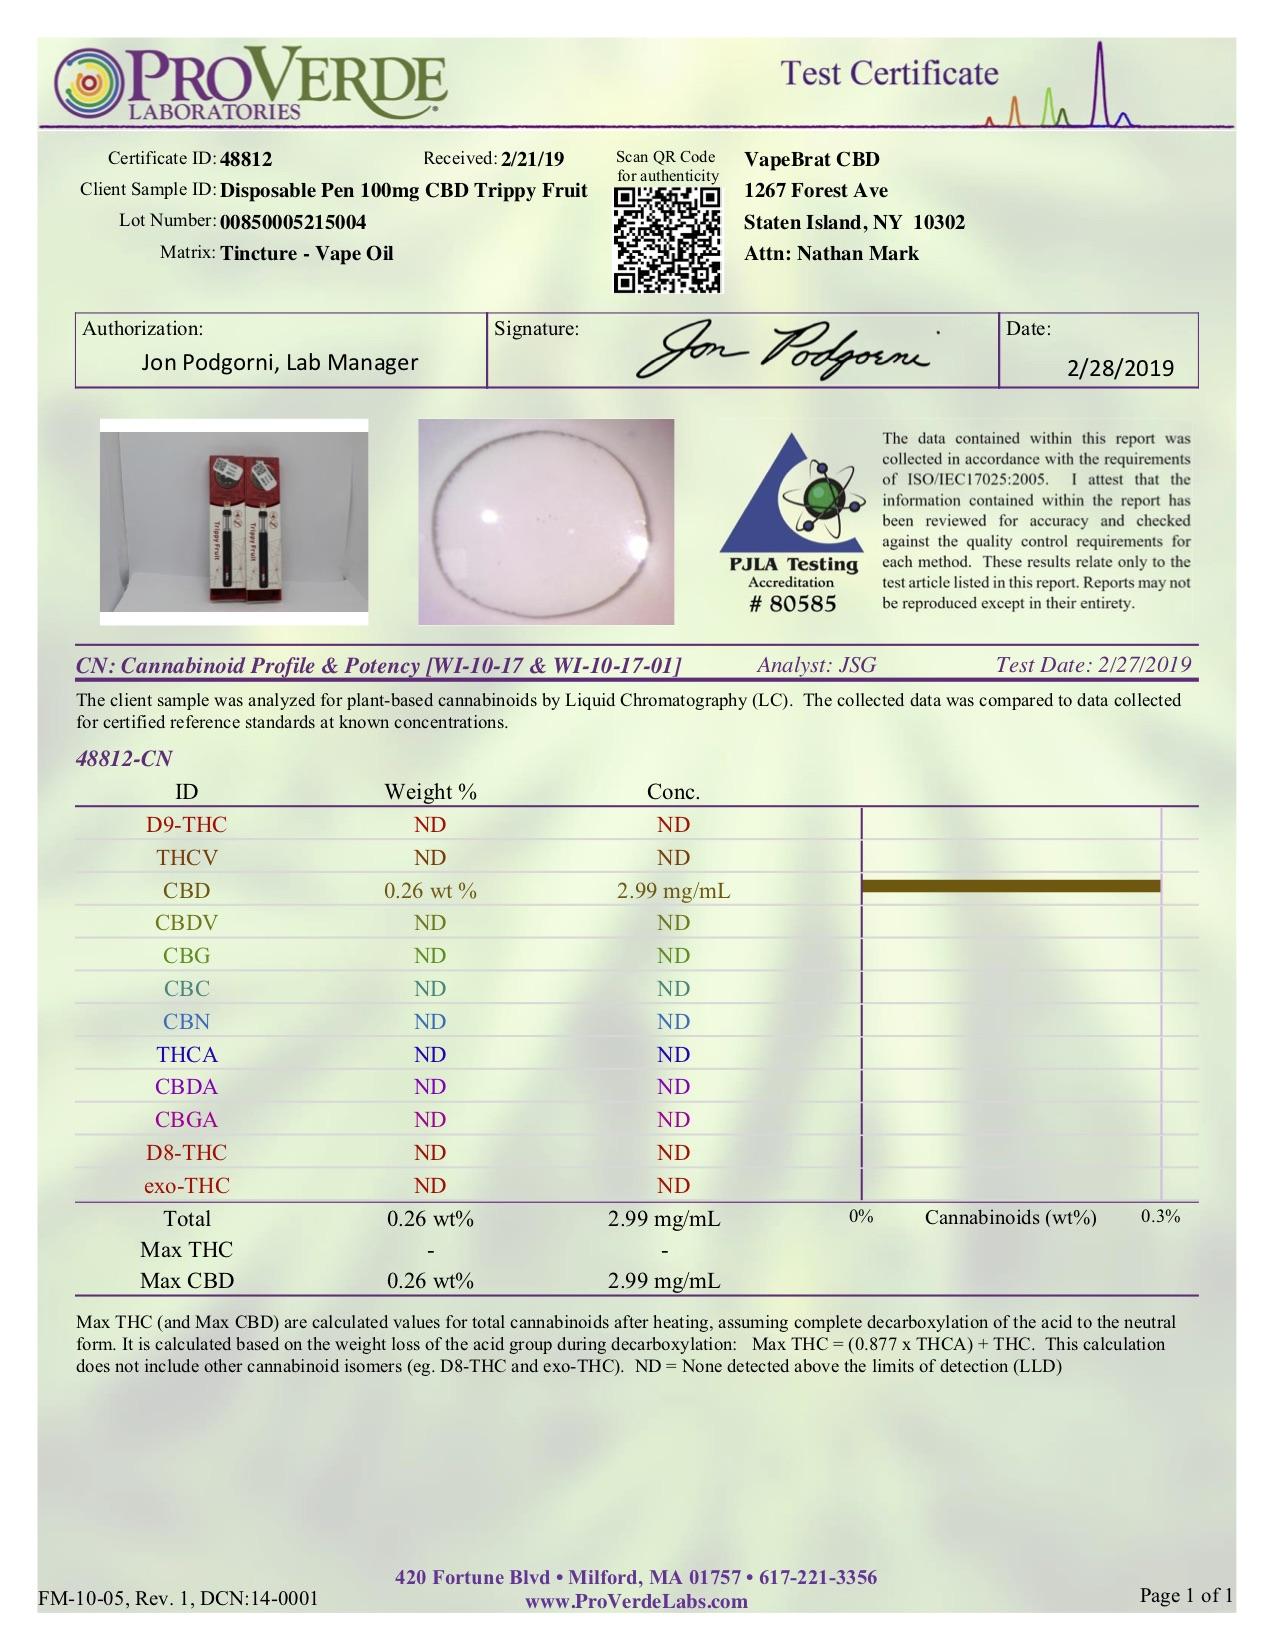 48812-cn-disposable-pen-100mg-cbd-trippy-fruit.jpg